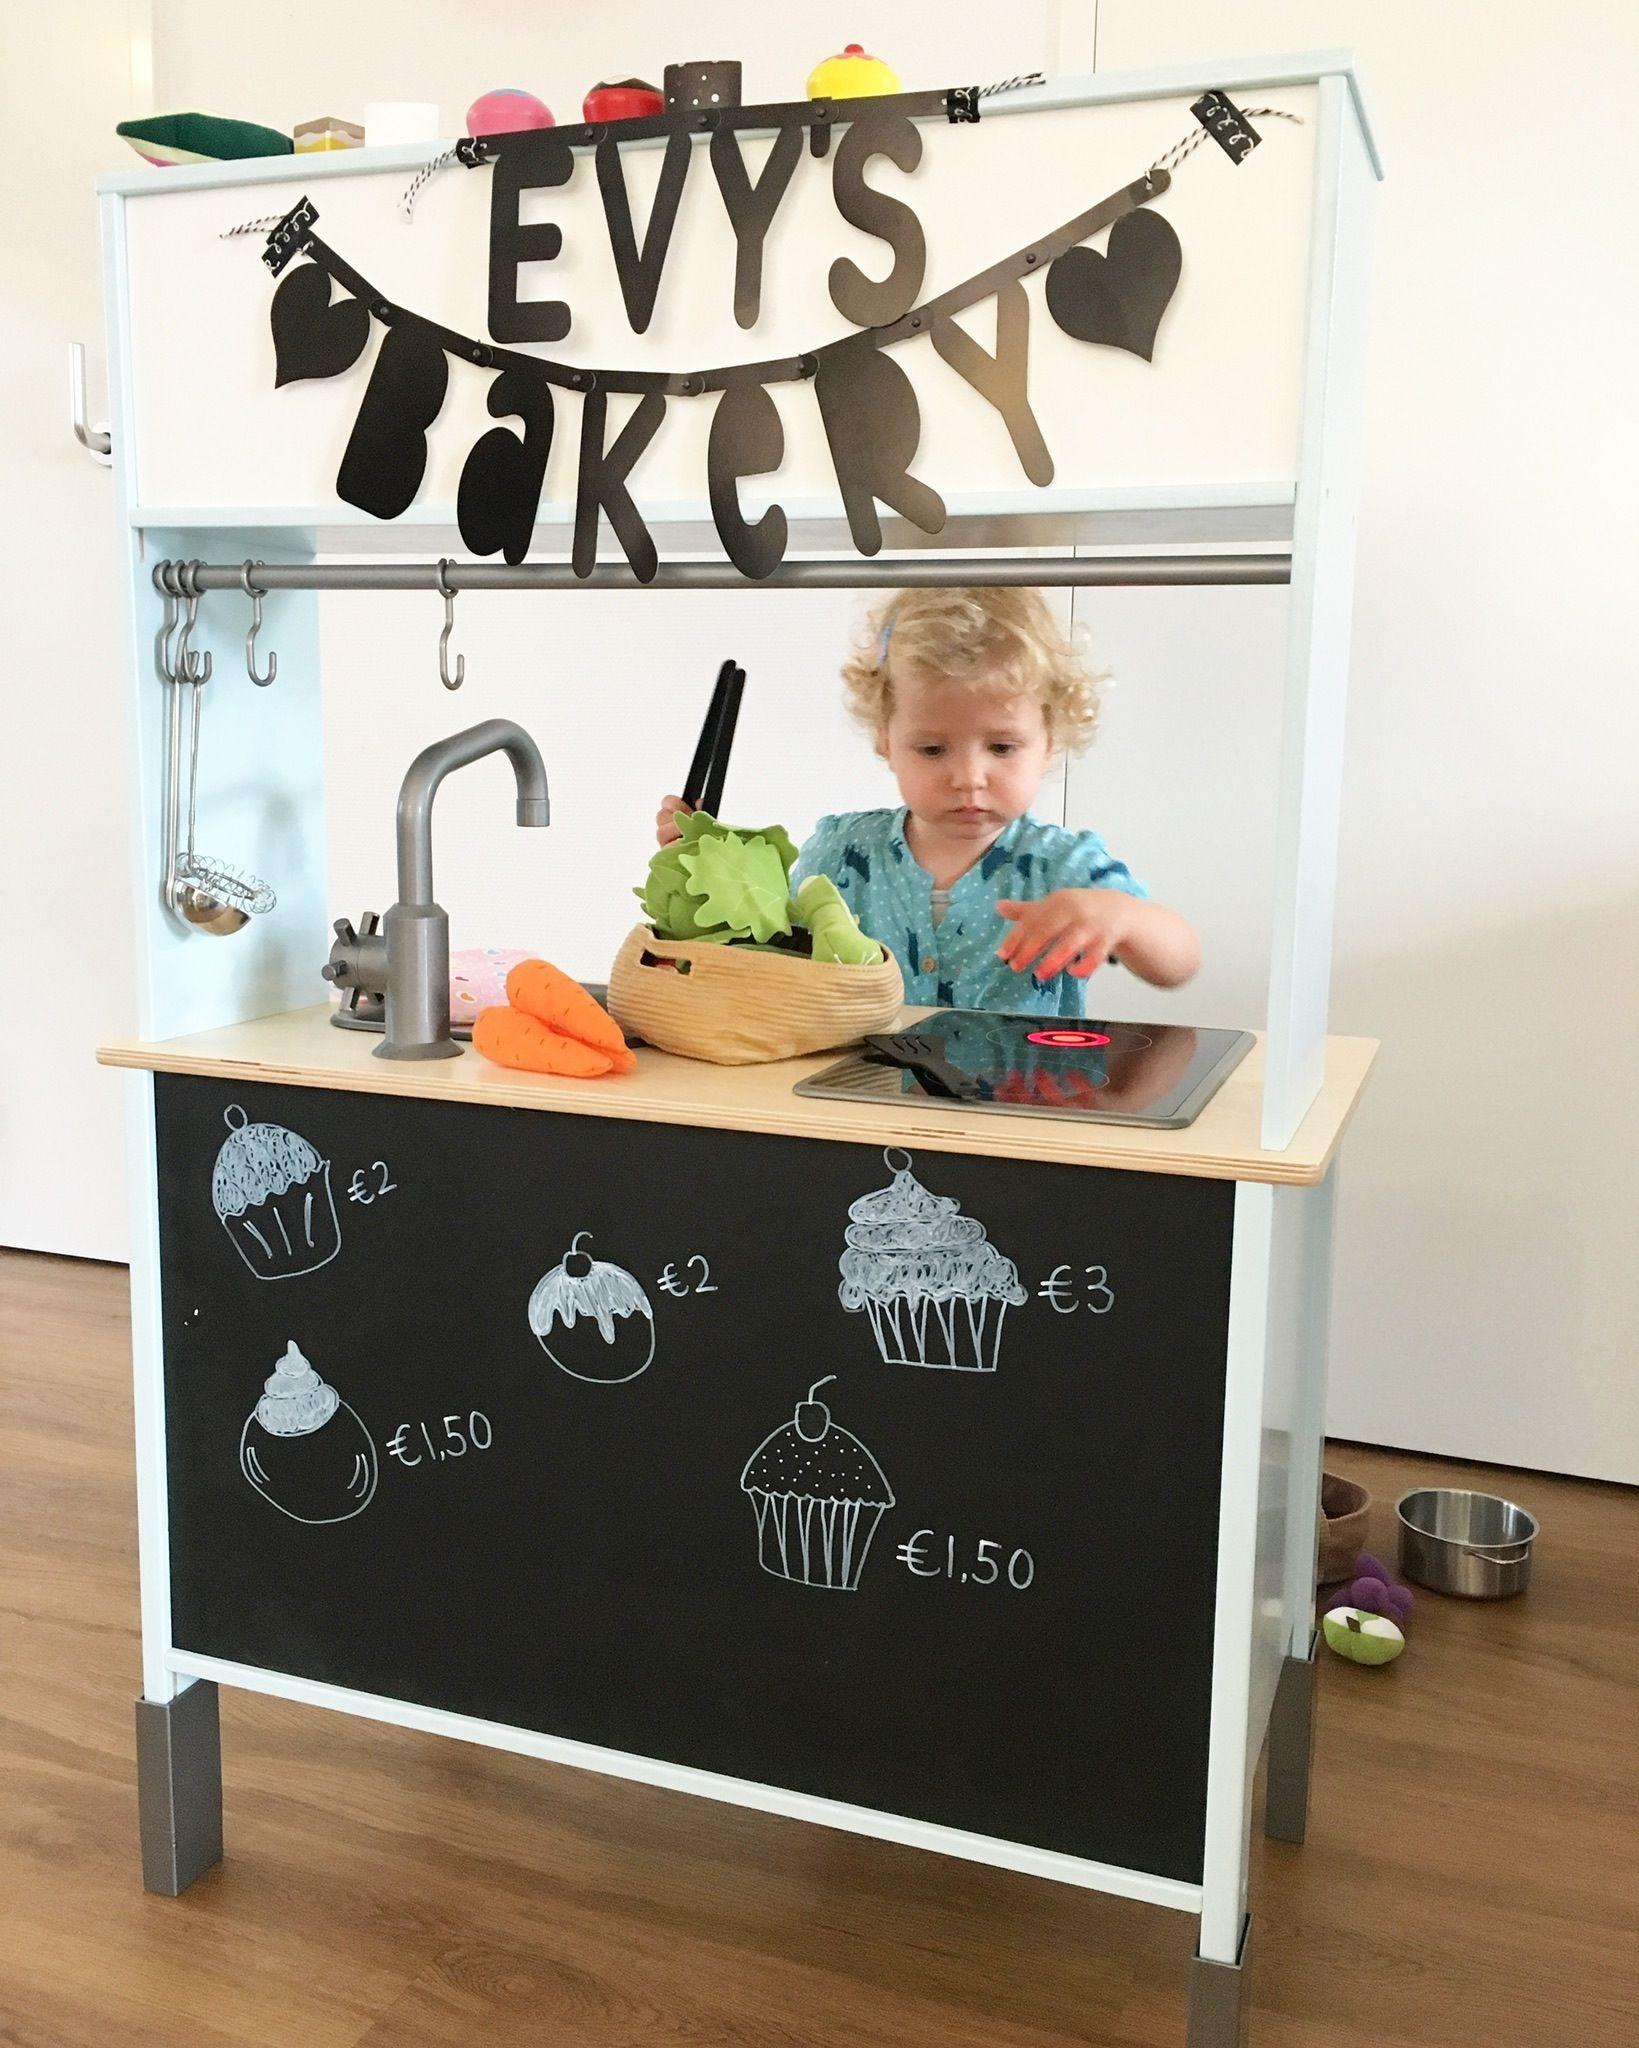 Ikea Küche Hack: Ikea Duktig Keukentje Pimpen